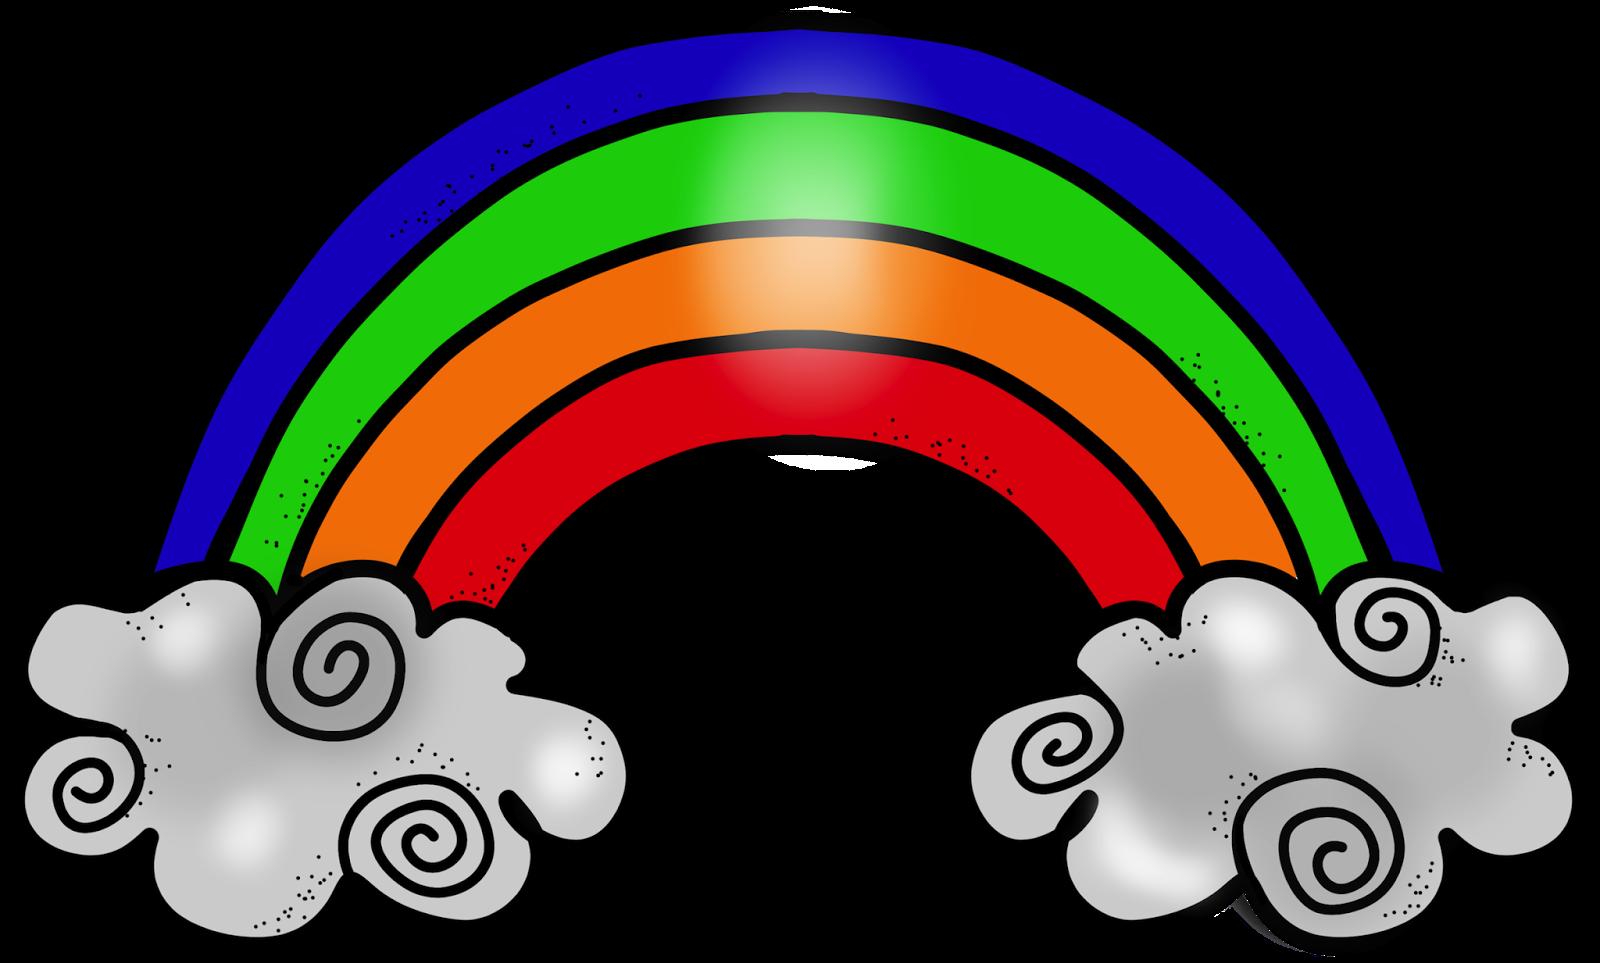 1600x963 Leprechaun Facts And Fun Literacy Activities